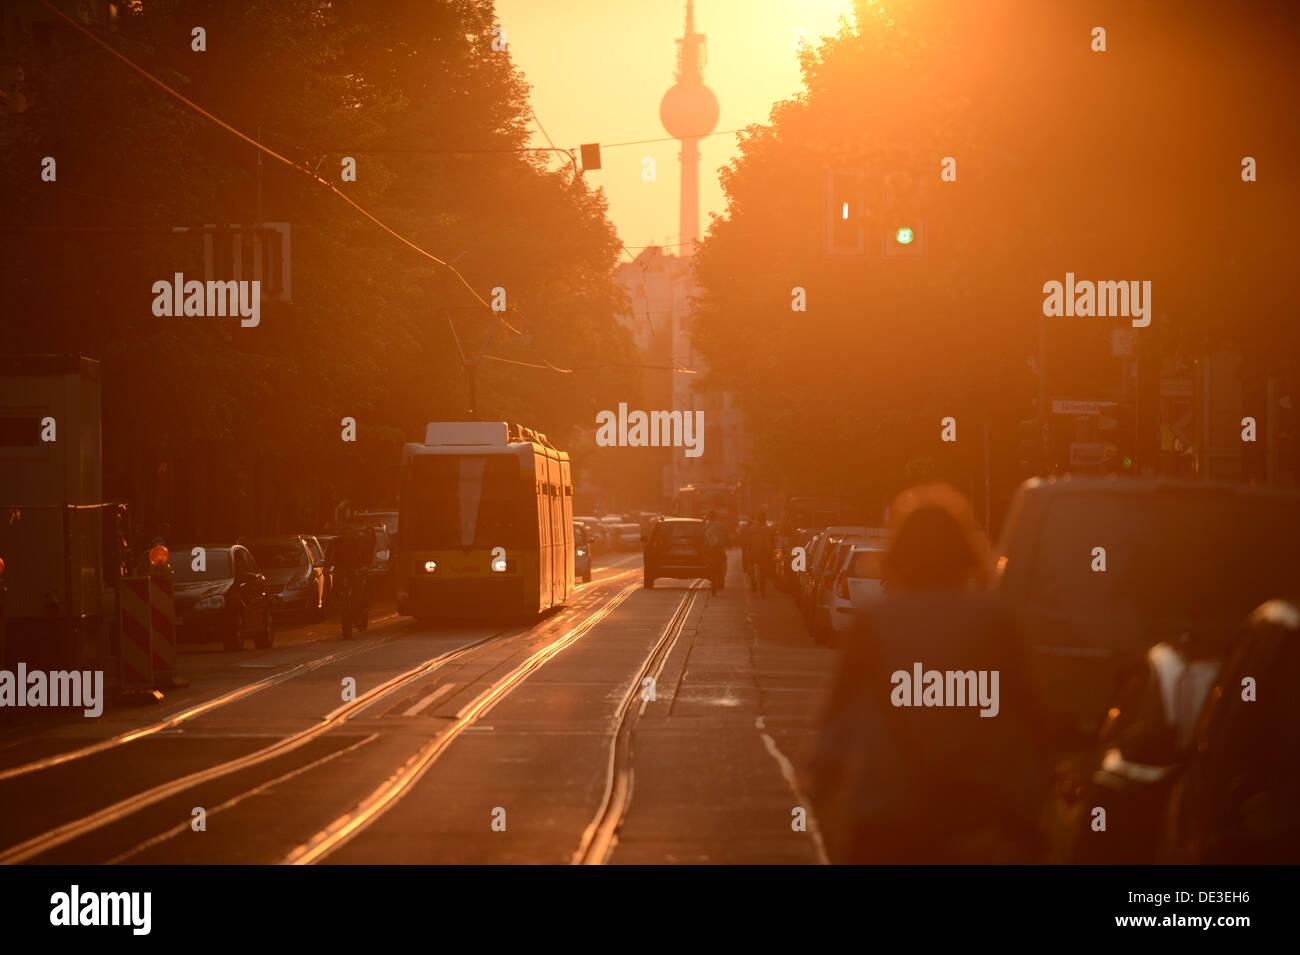 Berlín, Alemania, un tranvía en el Wühlischstrasse en Friedrichshain- Kreuzberg Imagen De Stock